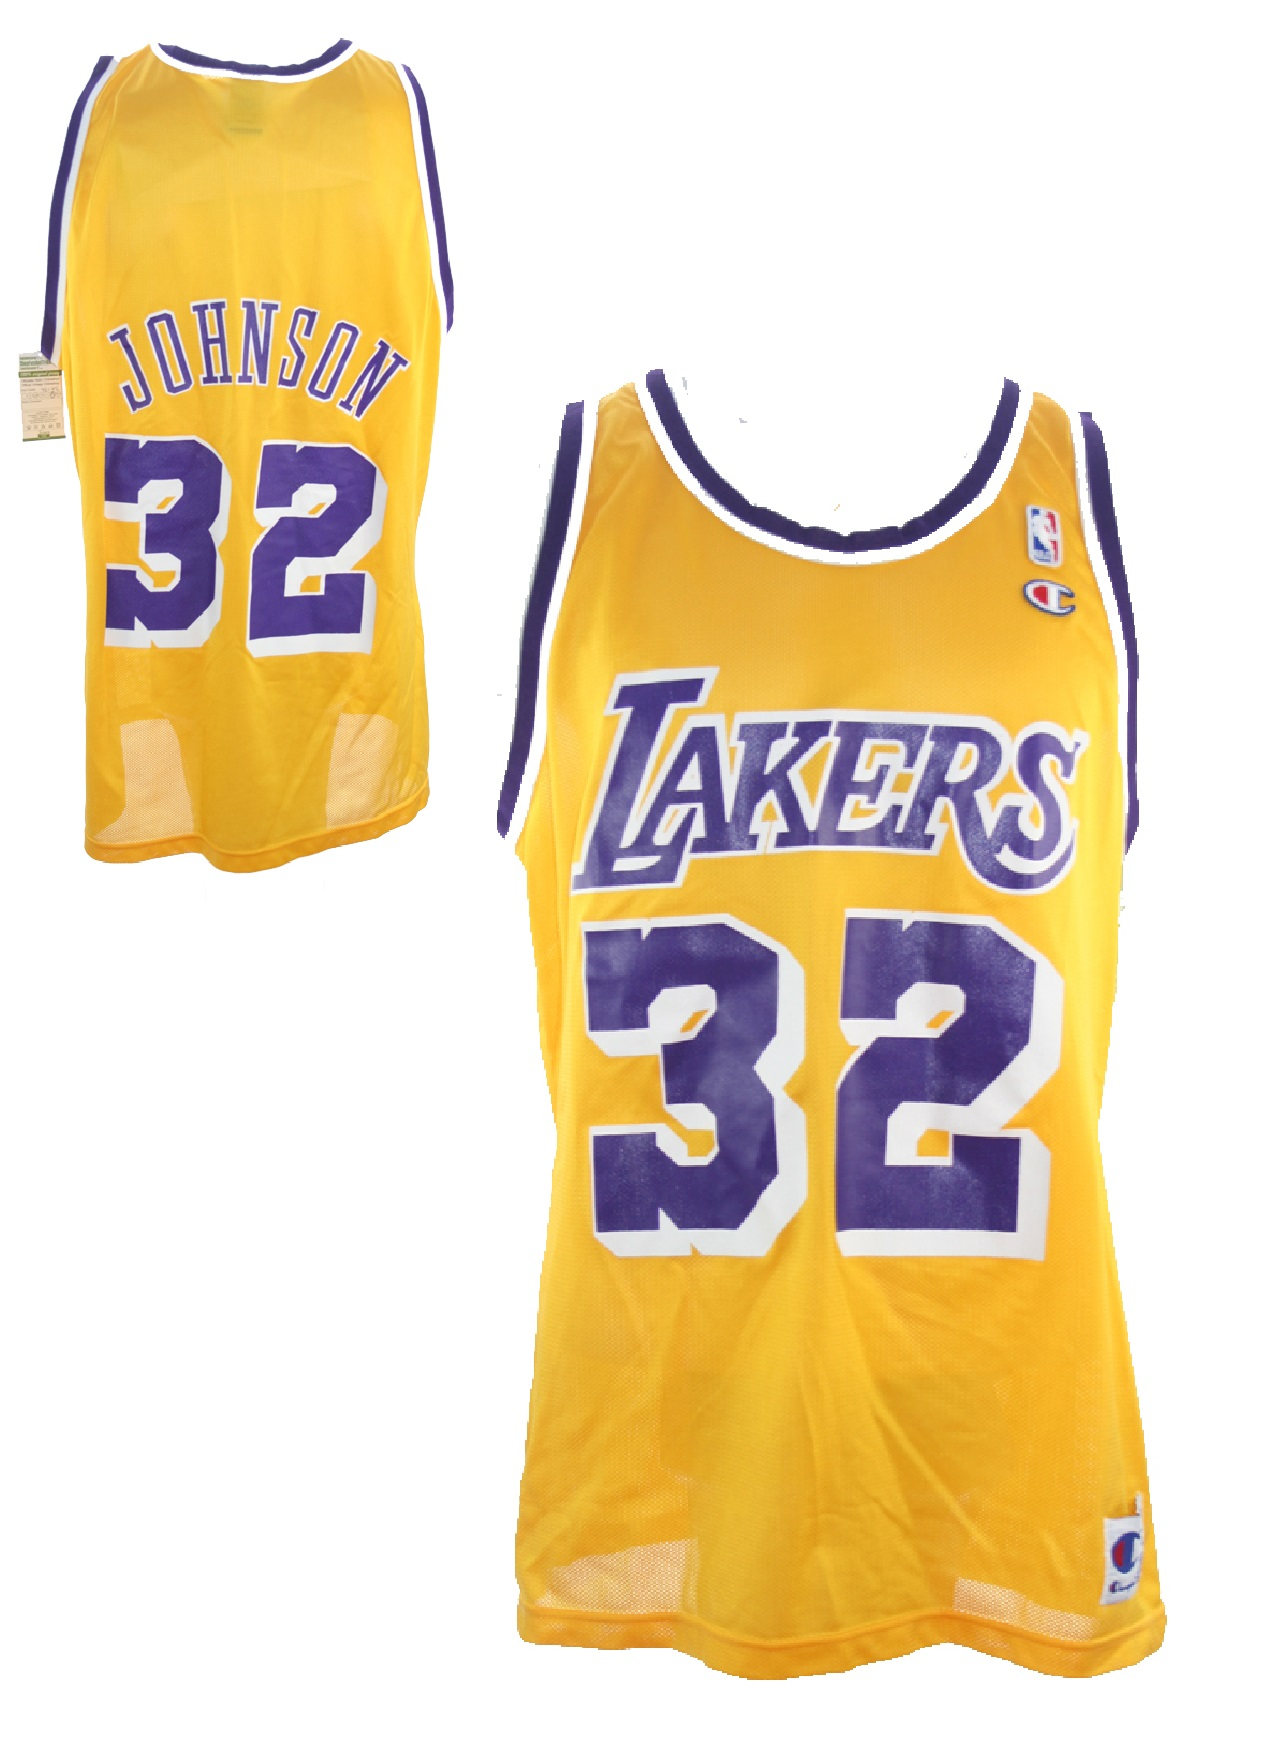 the best attitude d52dc 25418 Champion Los Angeles L.A. Lakers Jersey 32 Magic Johnson ...